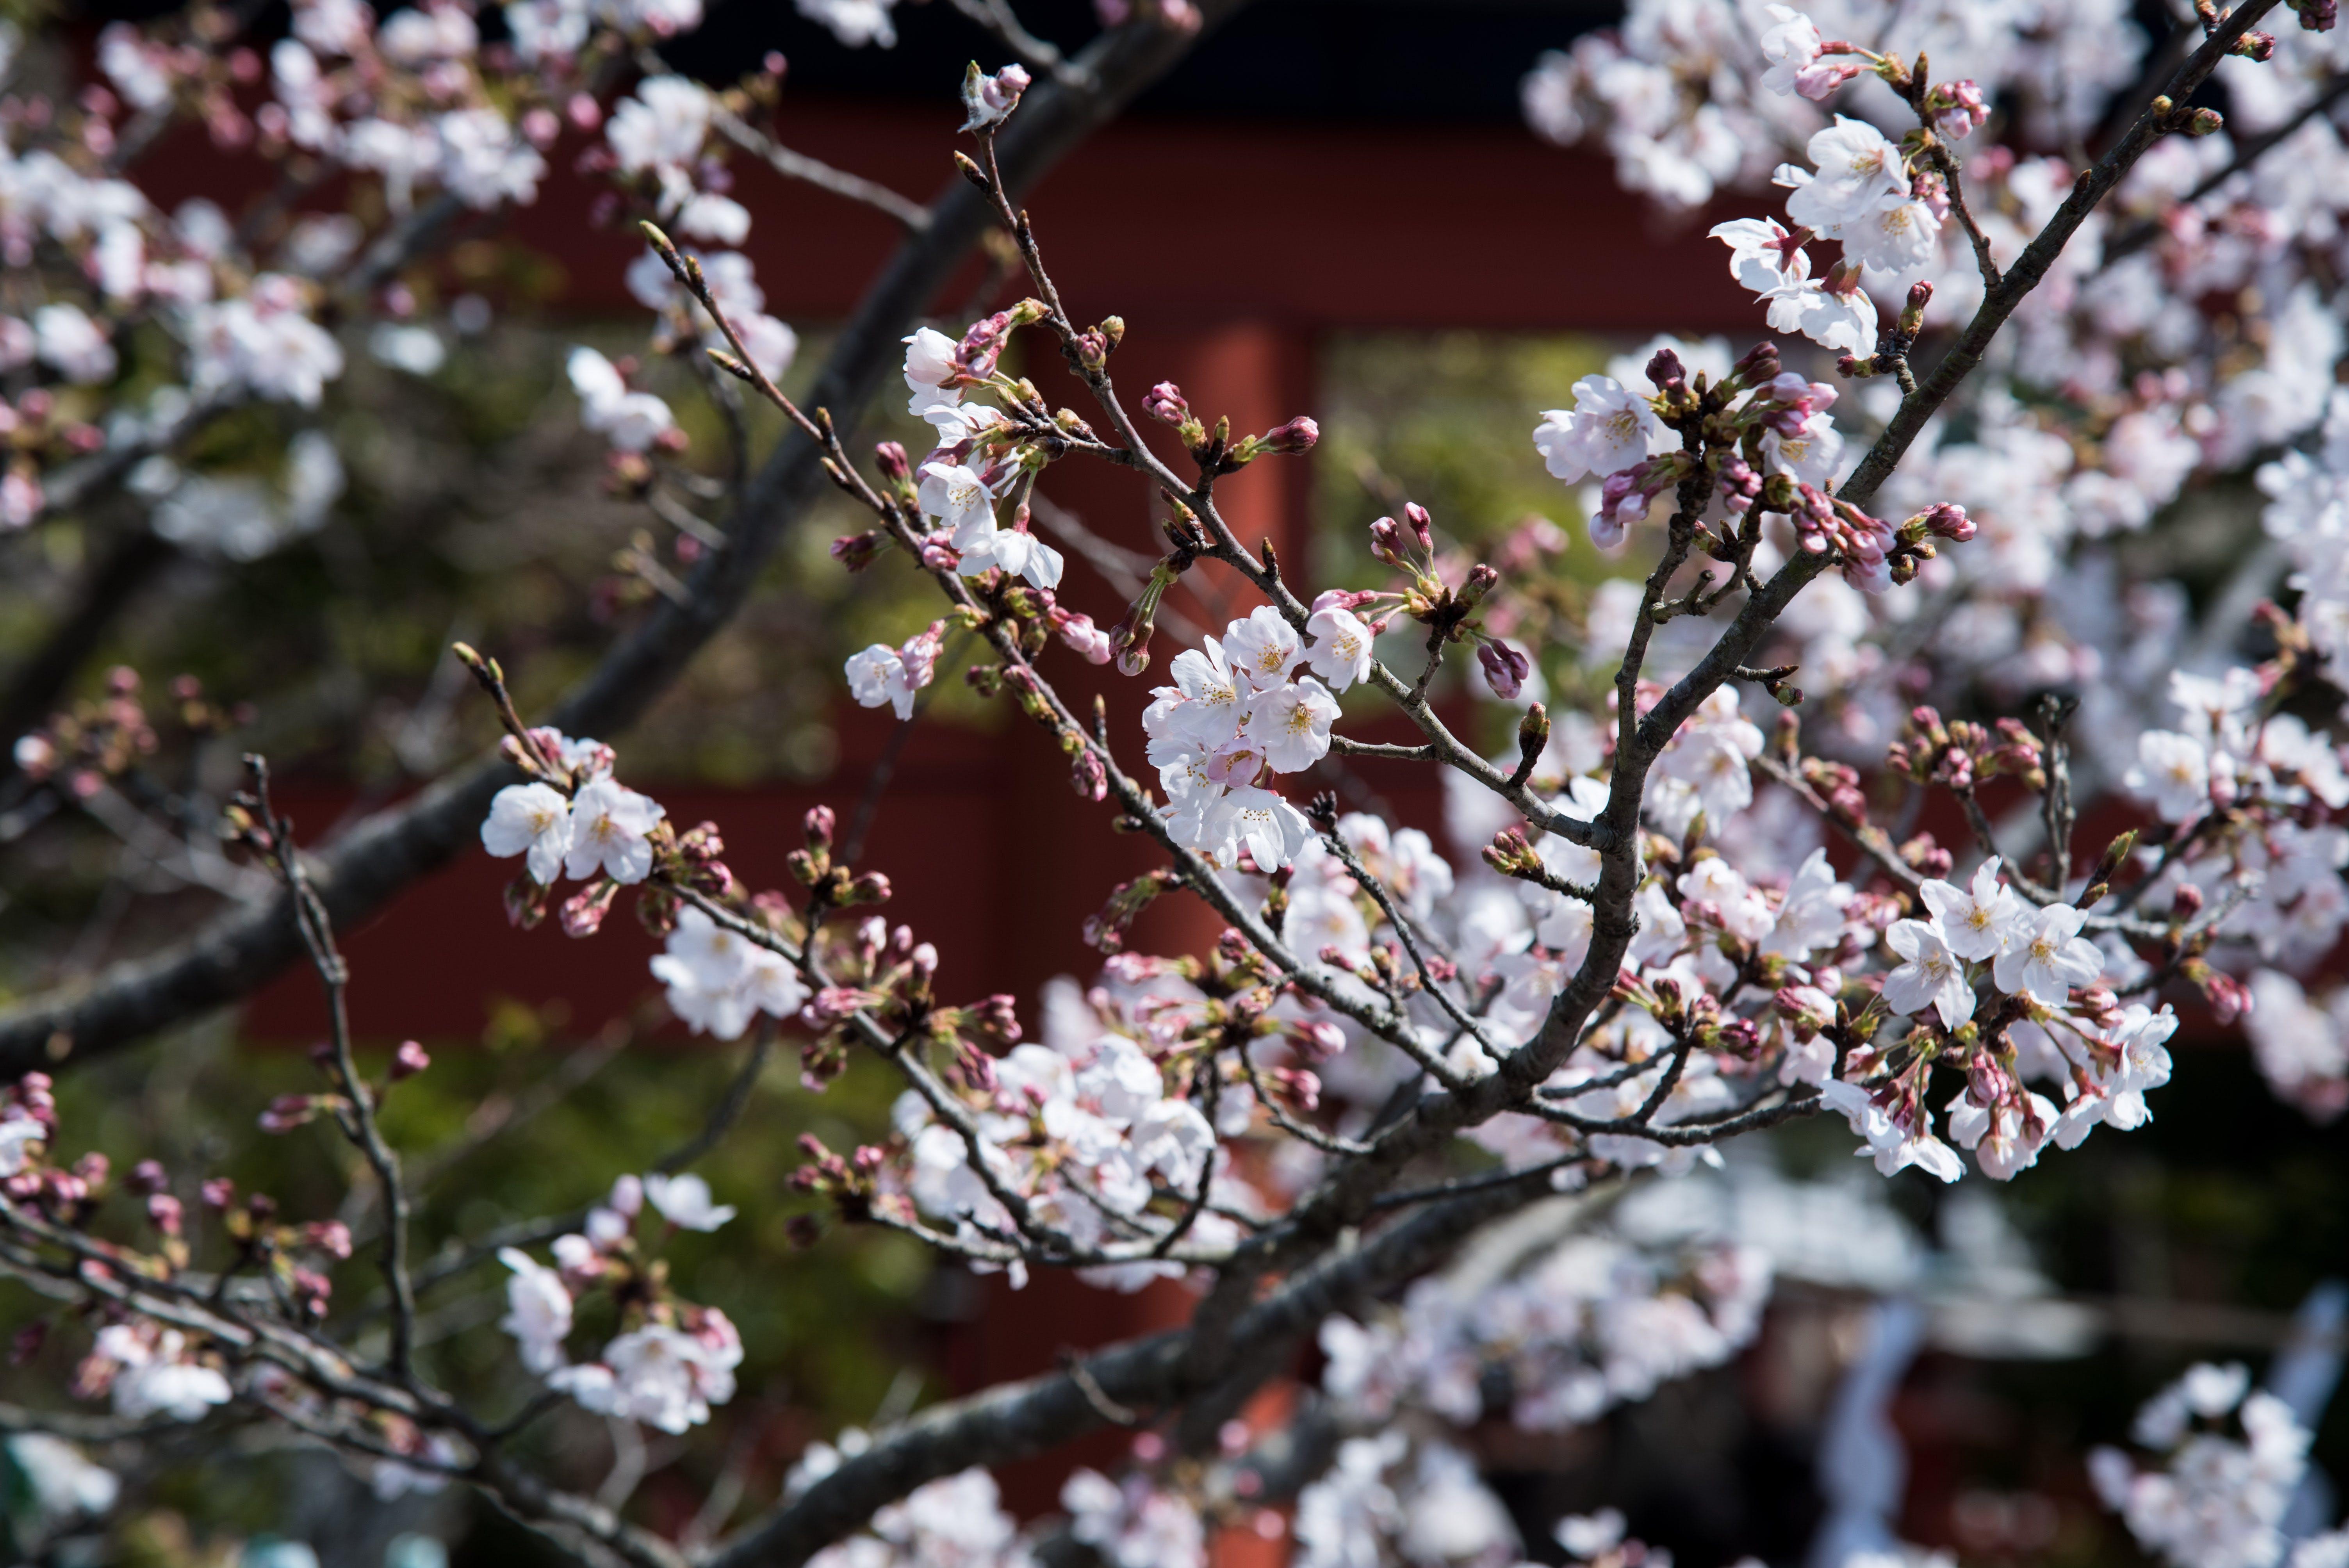 Macro Photography of White Flowers